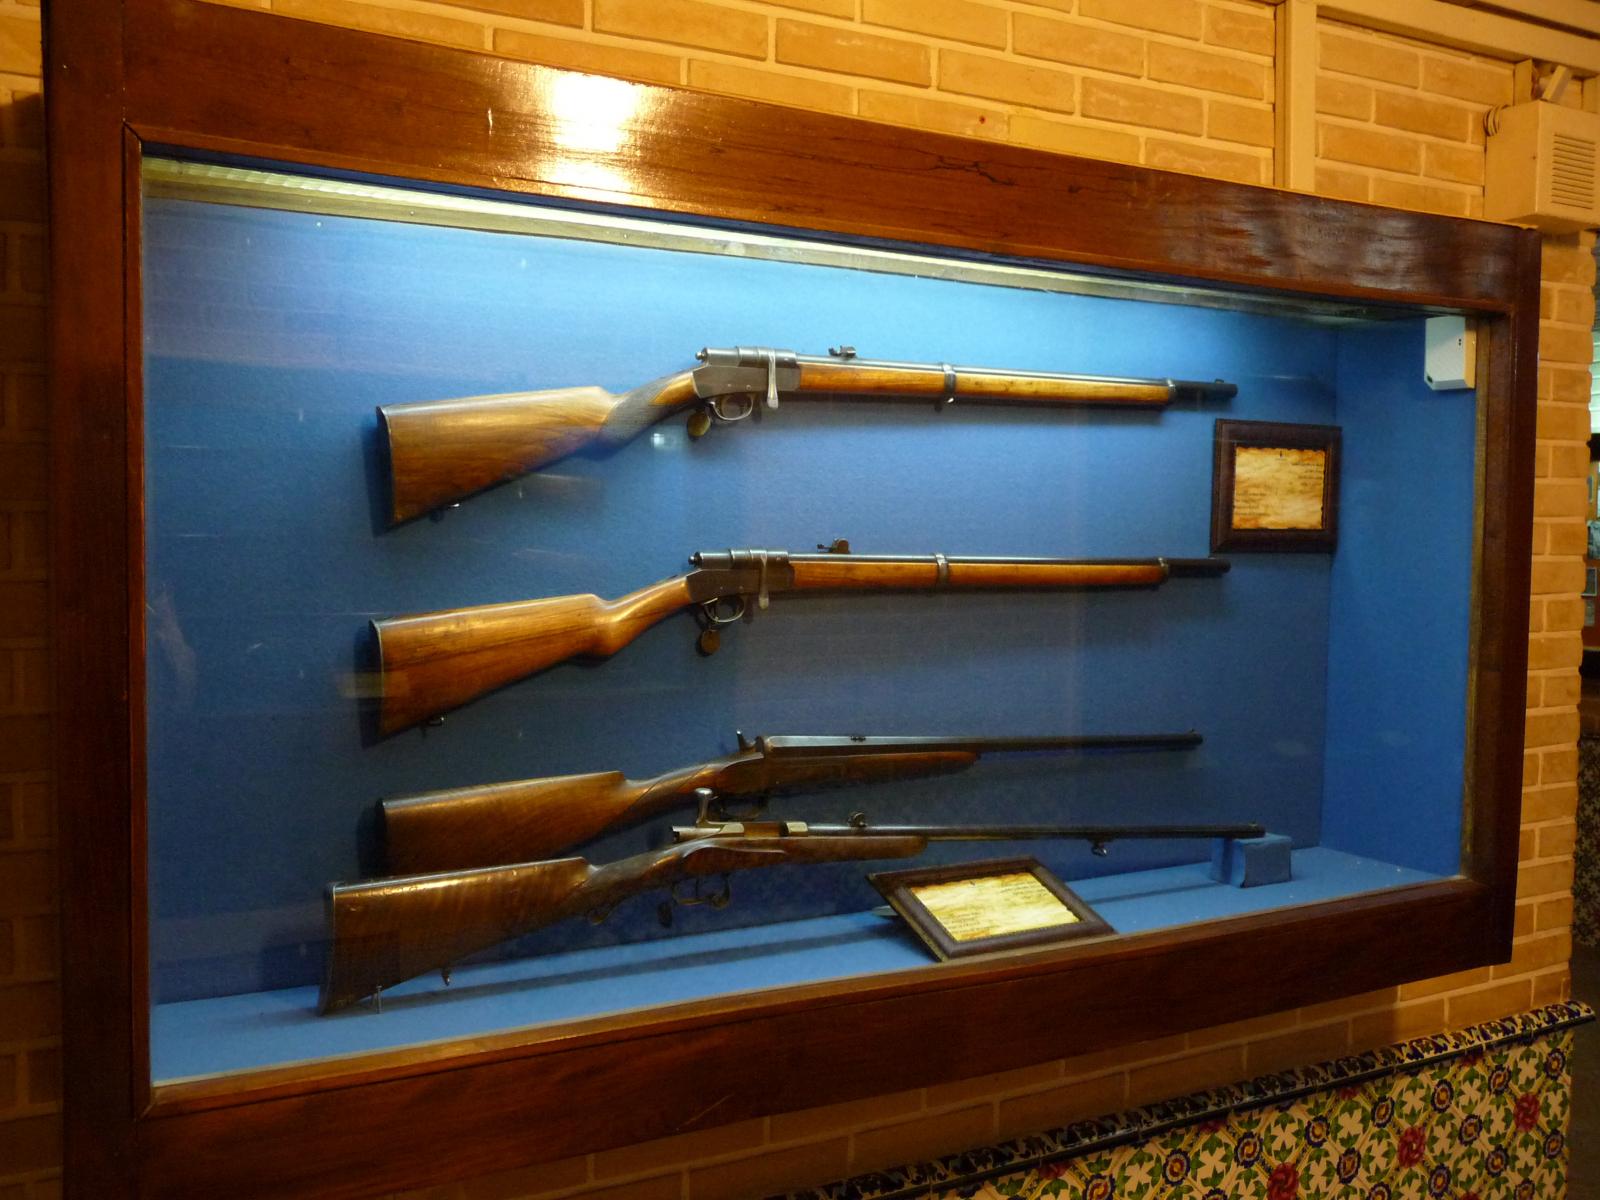 Baq-e Afifabad - Museum - Rifle 75mm Anti Armor